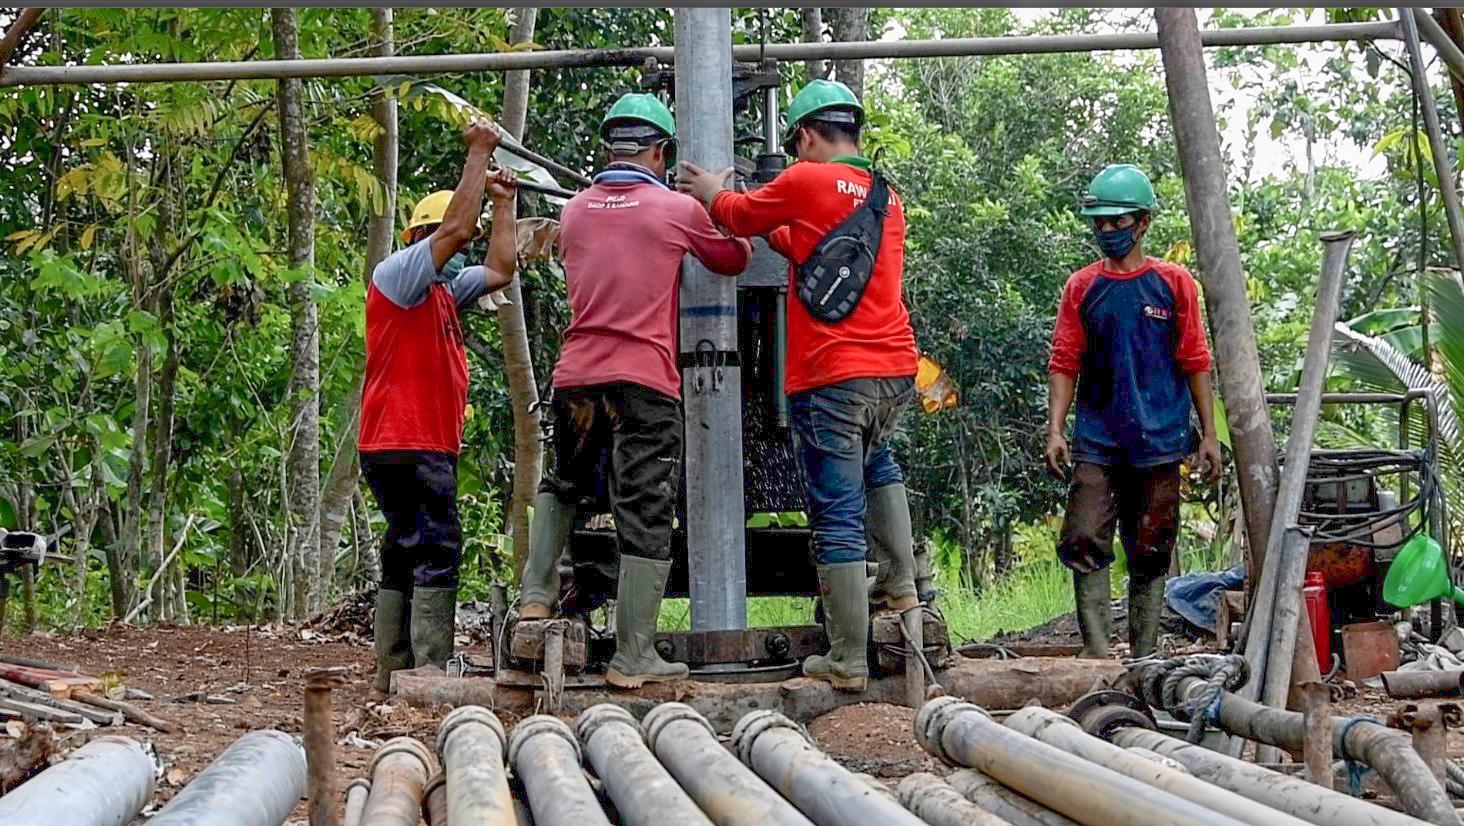 Pengembangan dan Pembangunan Jaringan Irigasi Air Tanah di Desa Tanggulun Barat (6)